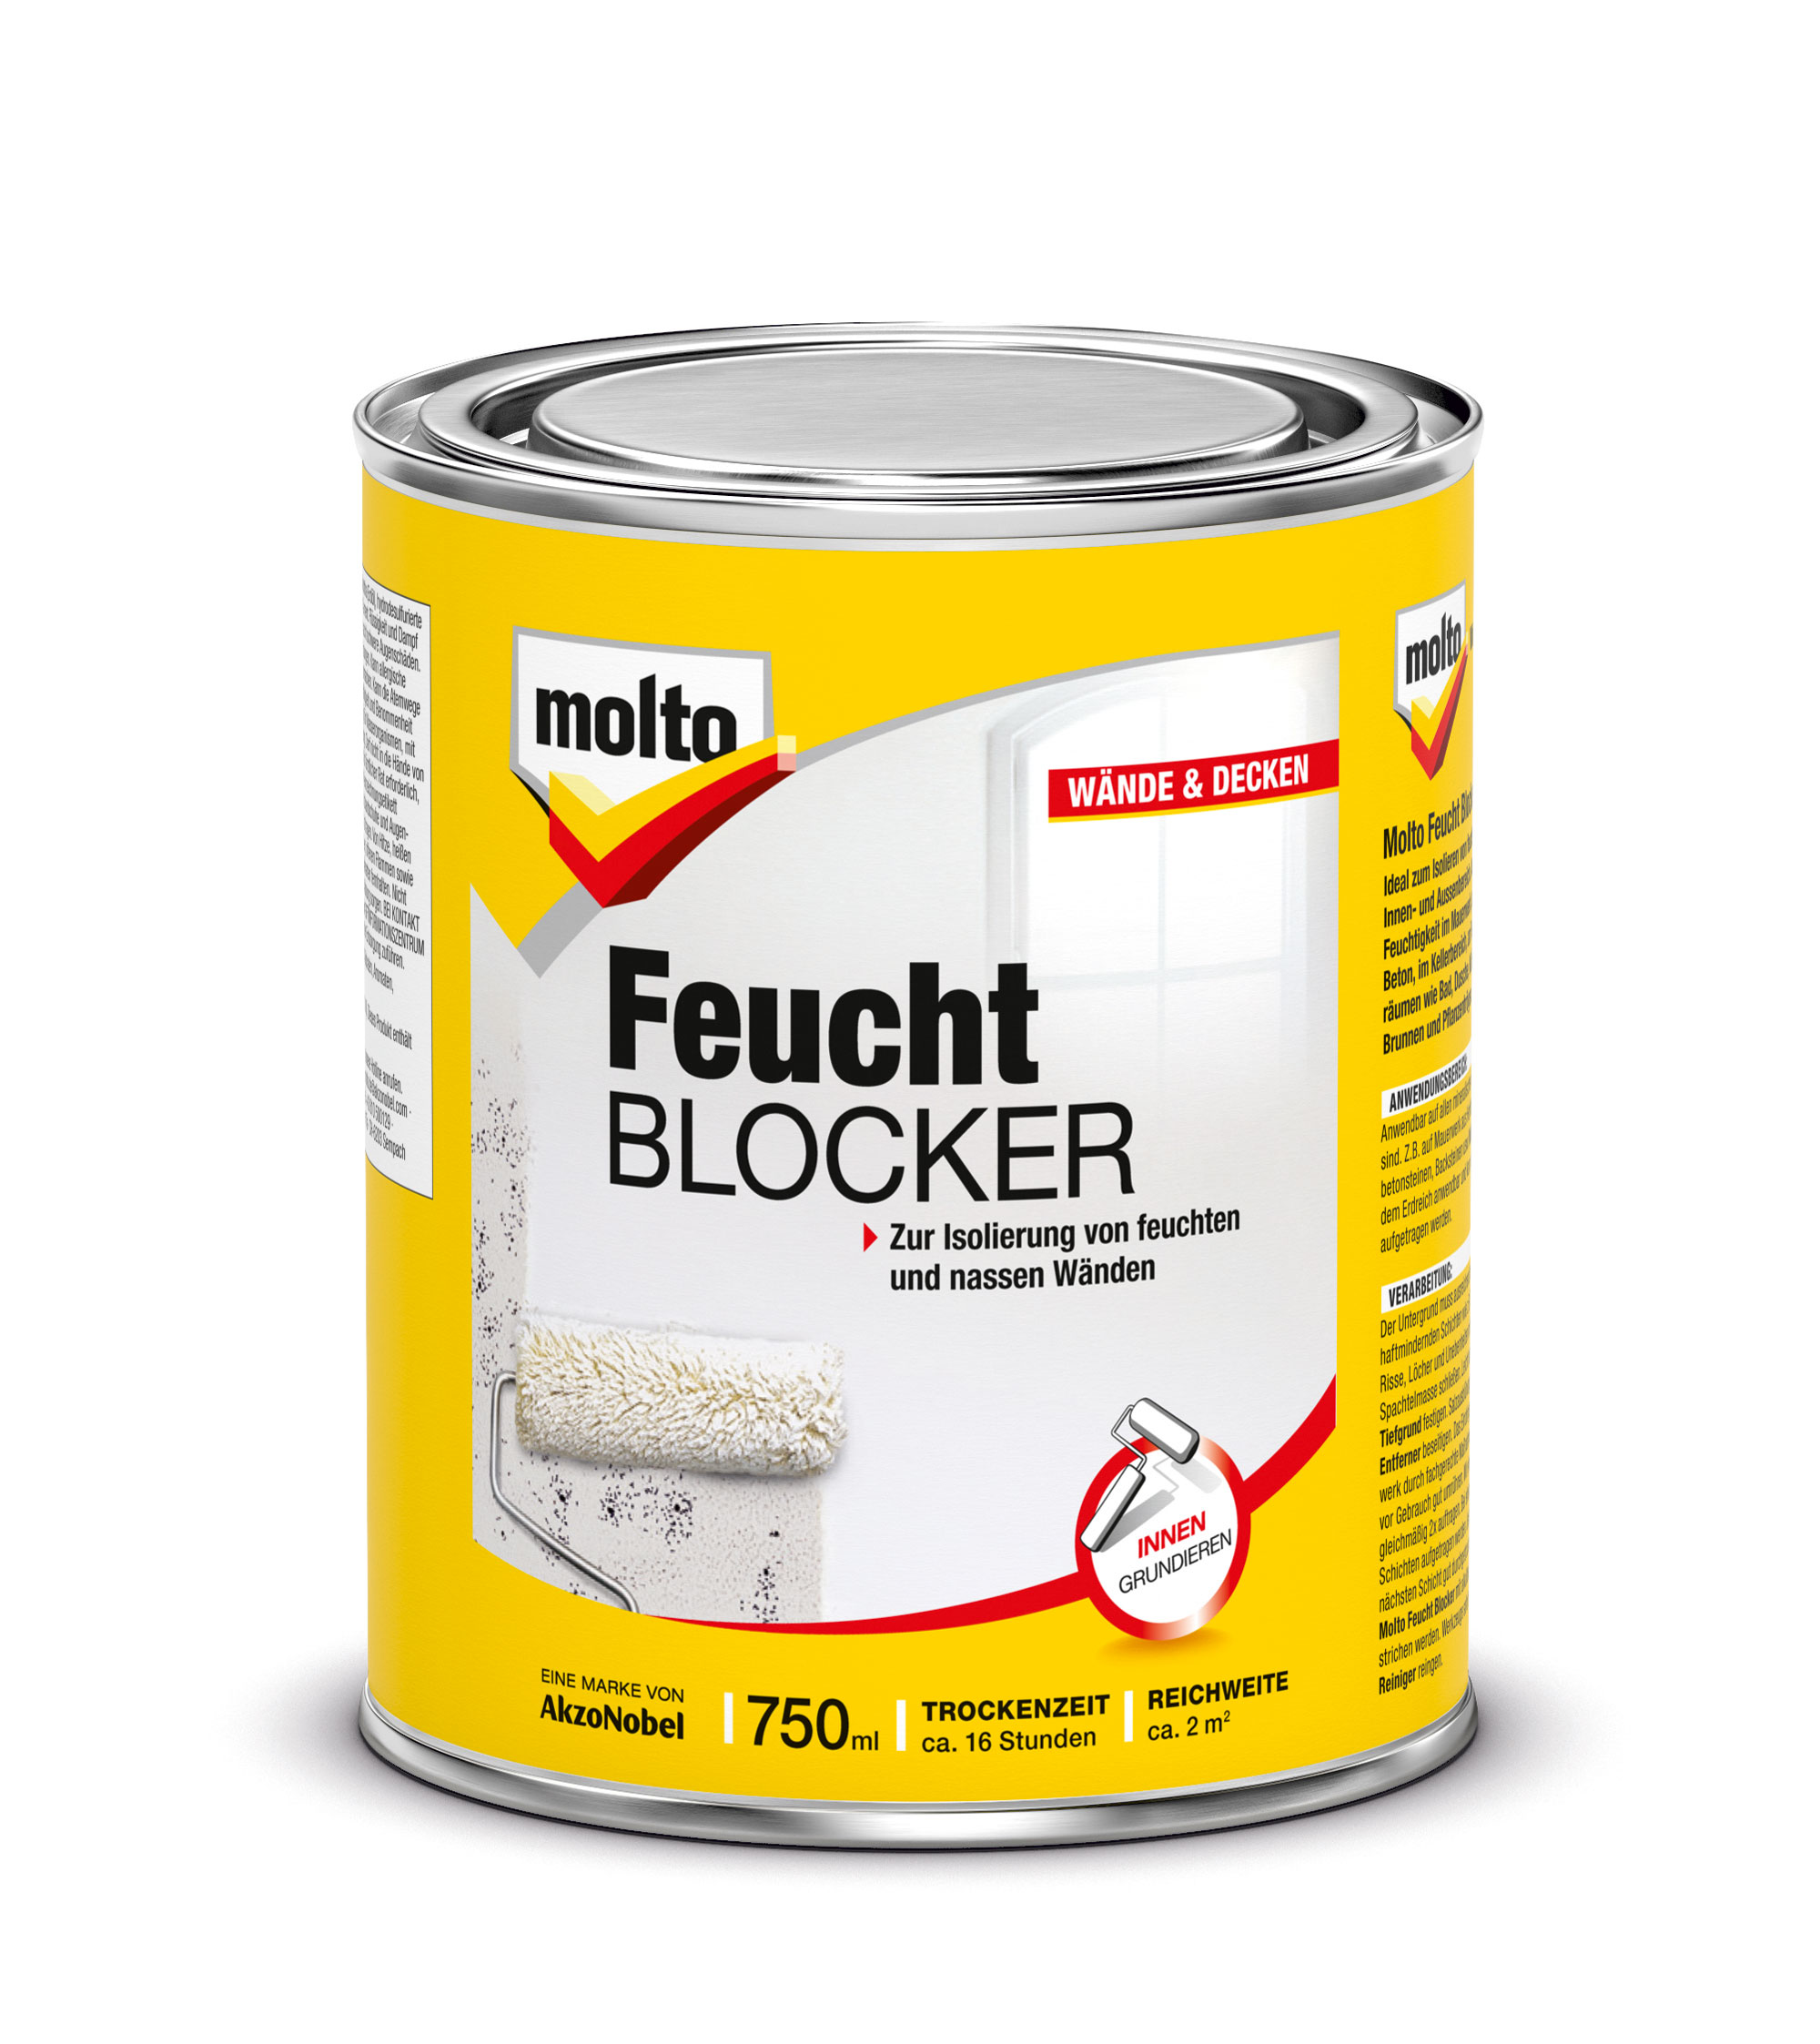 Molto Feucht-Blocker 750 ml Bild 1